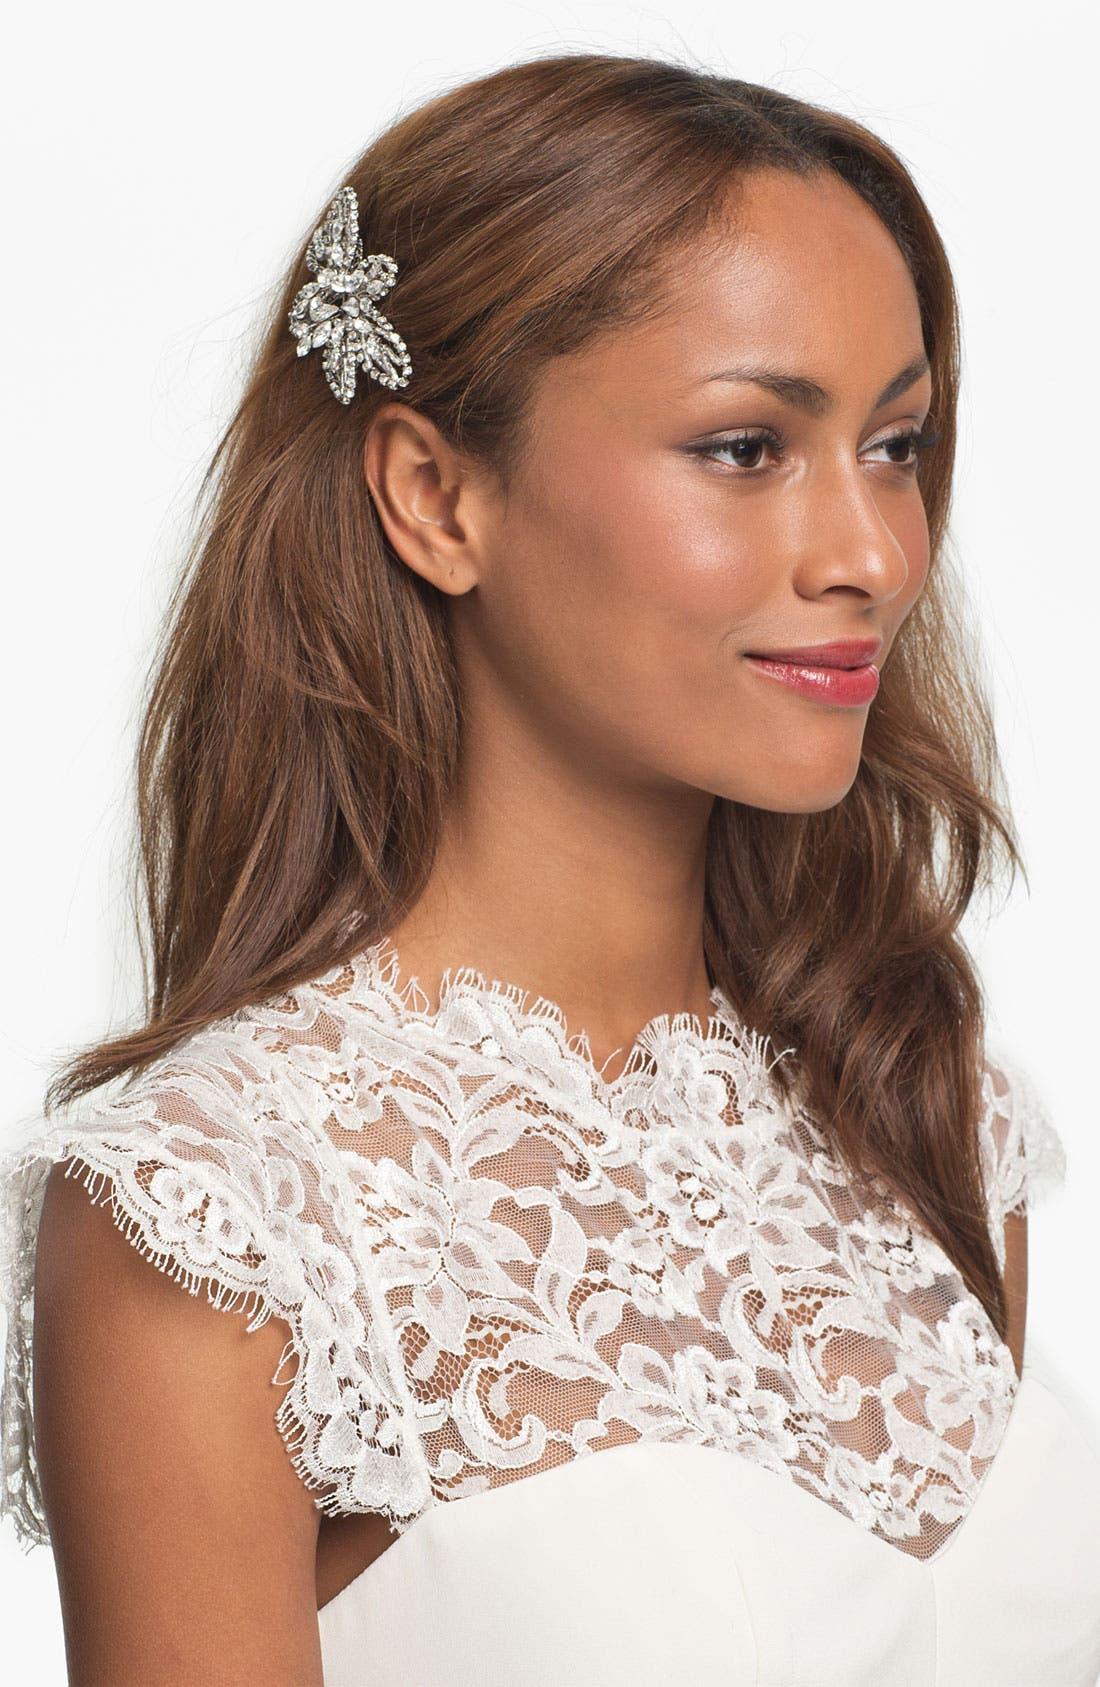 NINA 'Danai' Flower Crystal Hair Comb, Main, color, 040